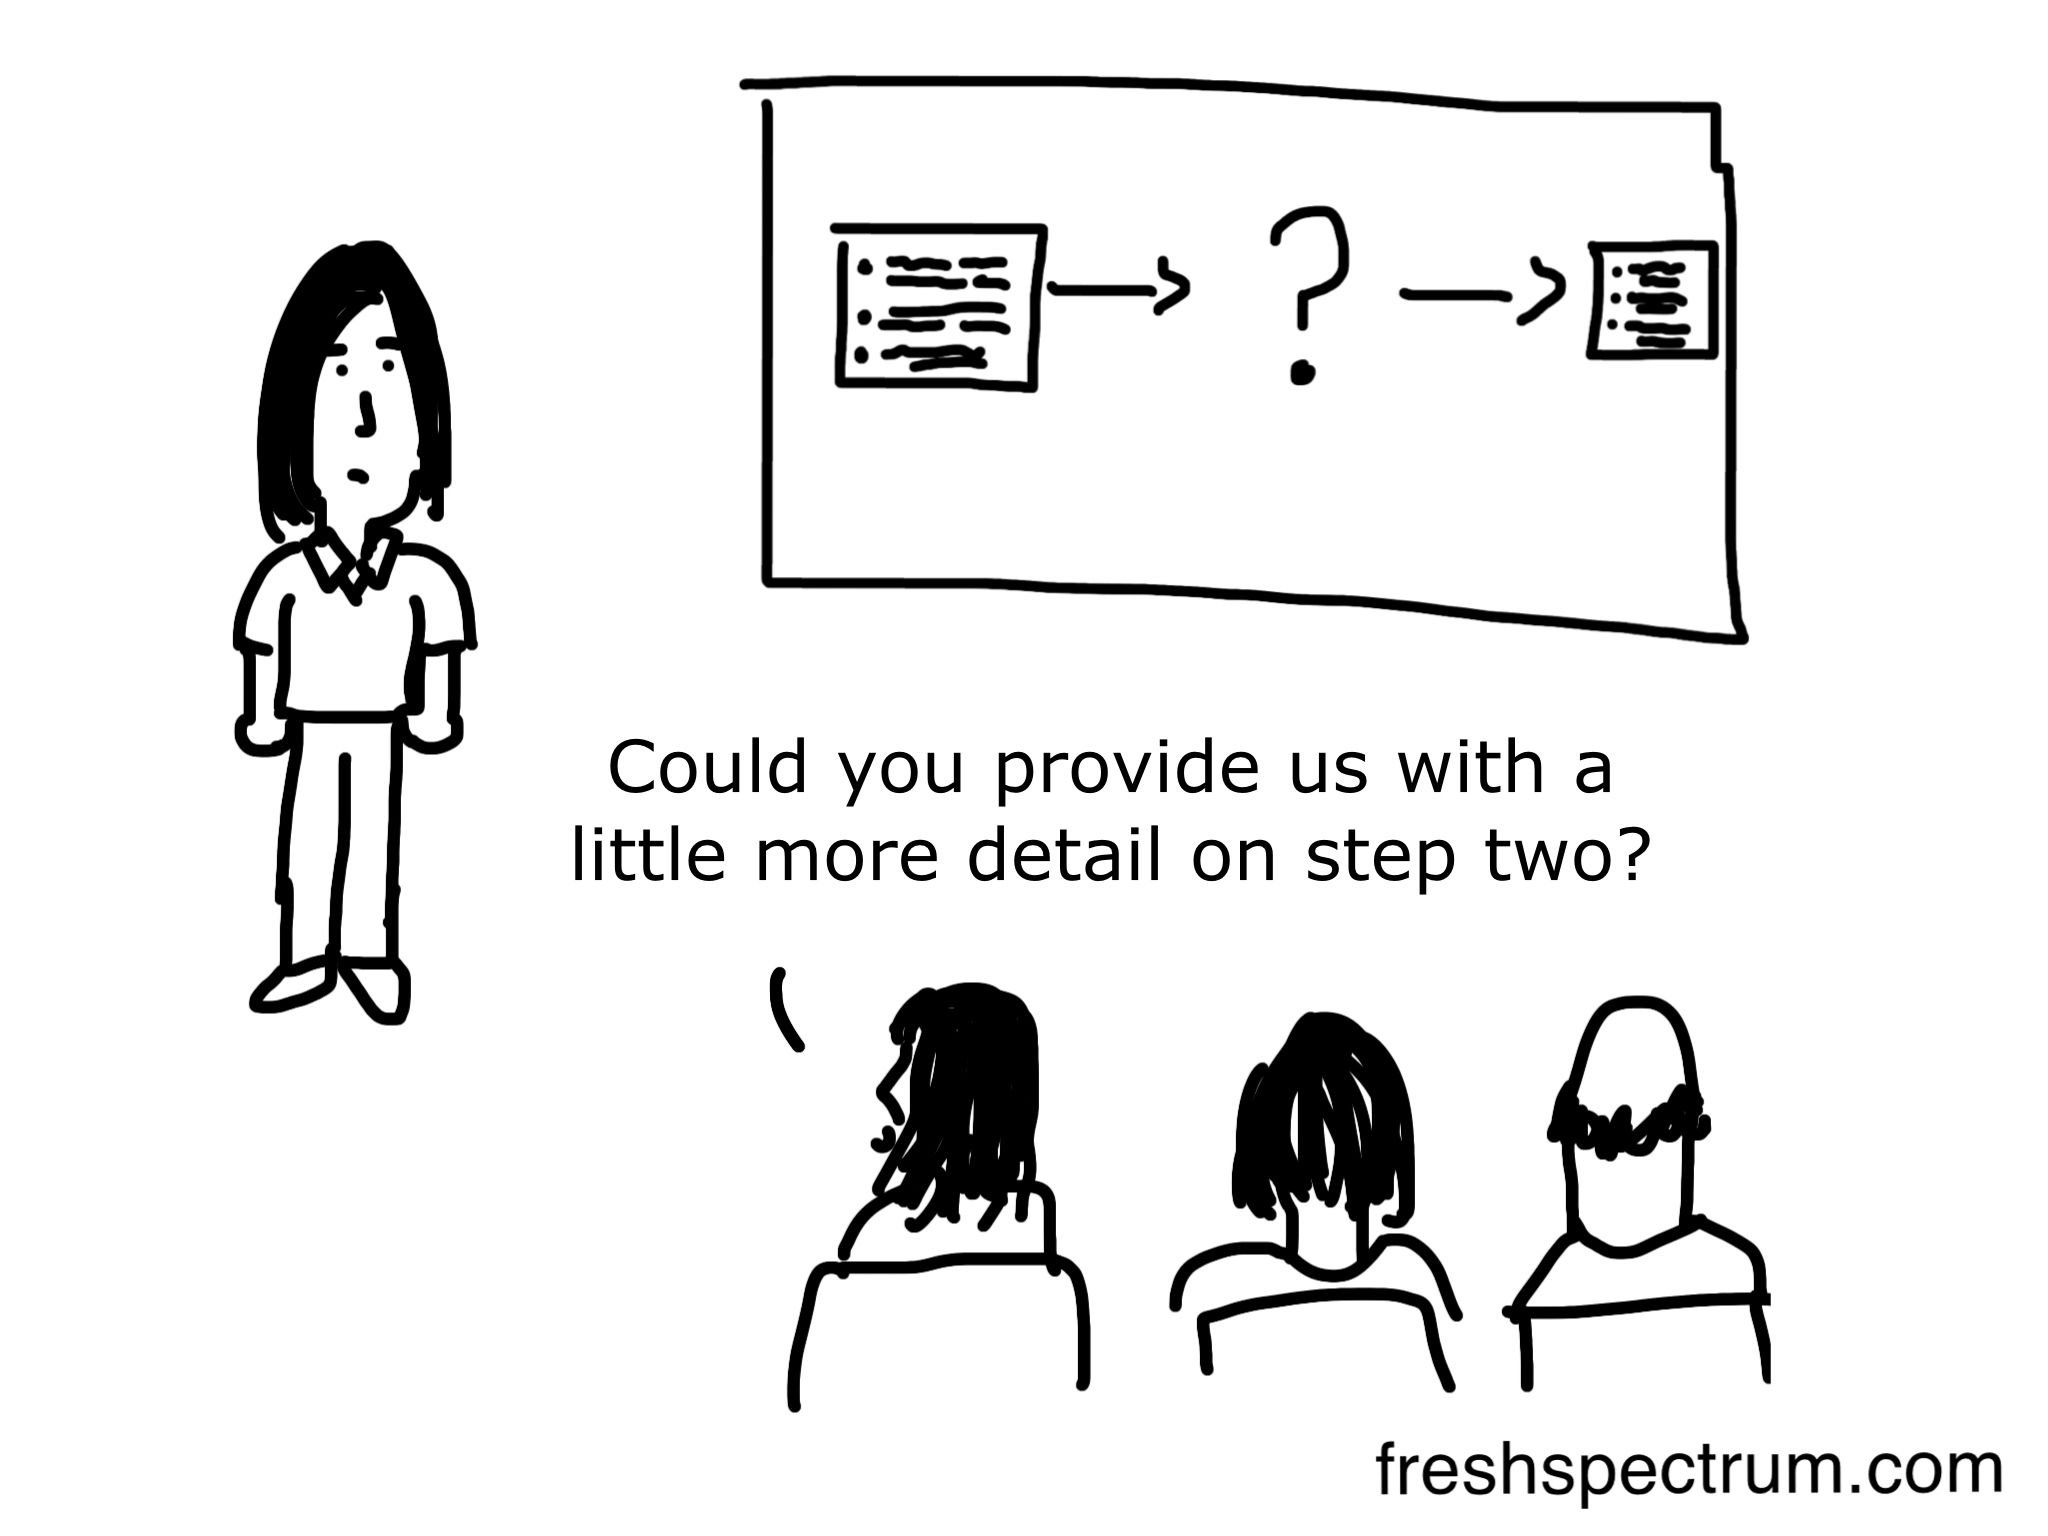 Michael Quinn Patton's Evaluation Flash Cards 5 Cartoons